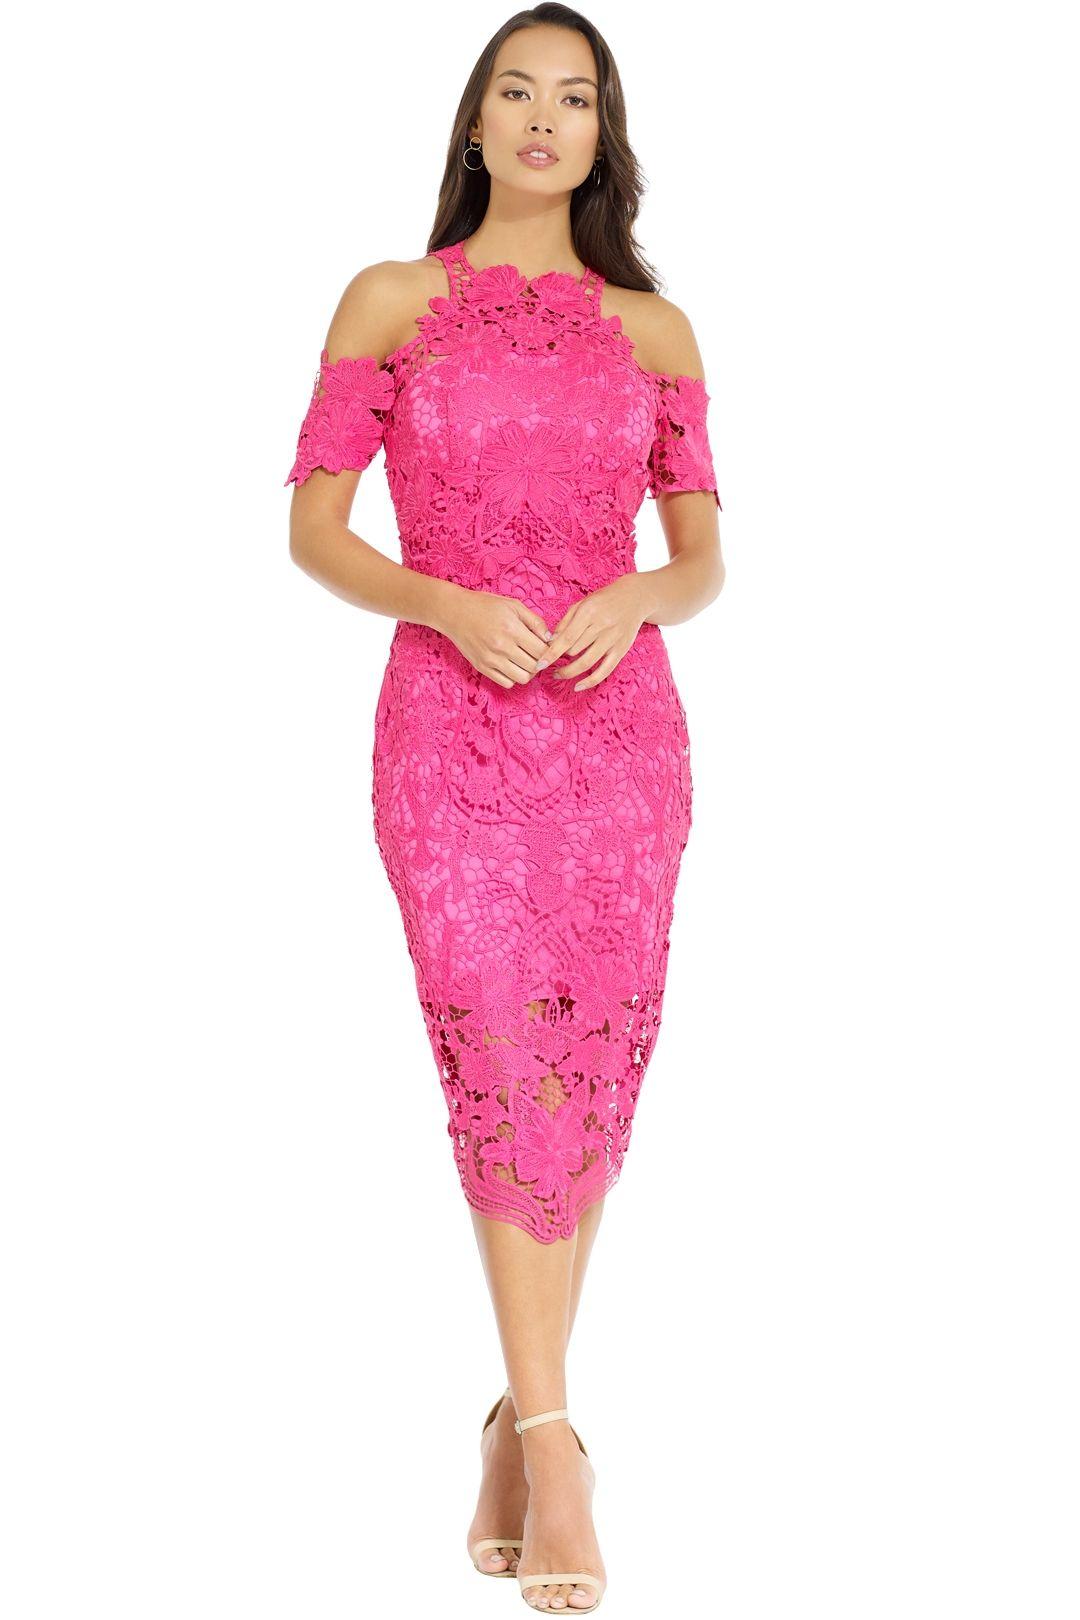 Thurley - Flower Bomb Lace Dress - Fuschia - Front